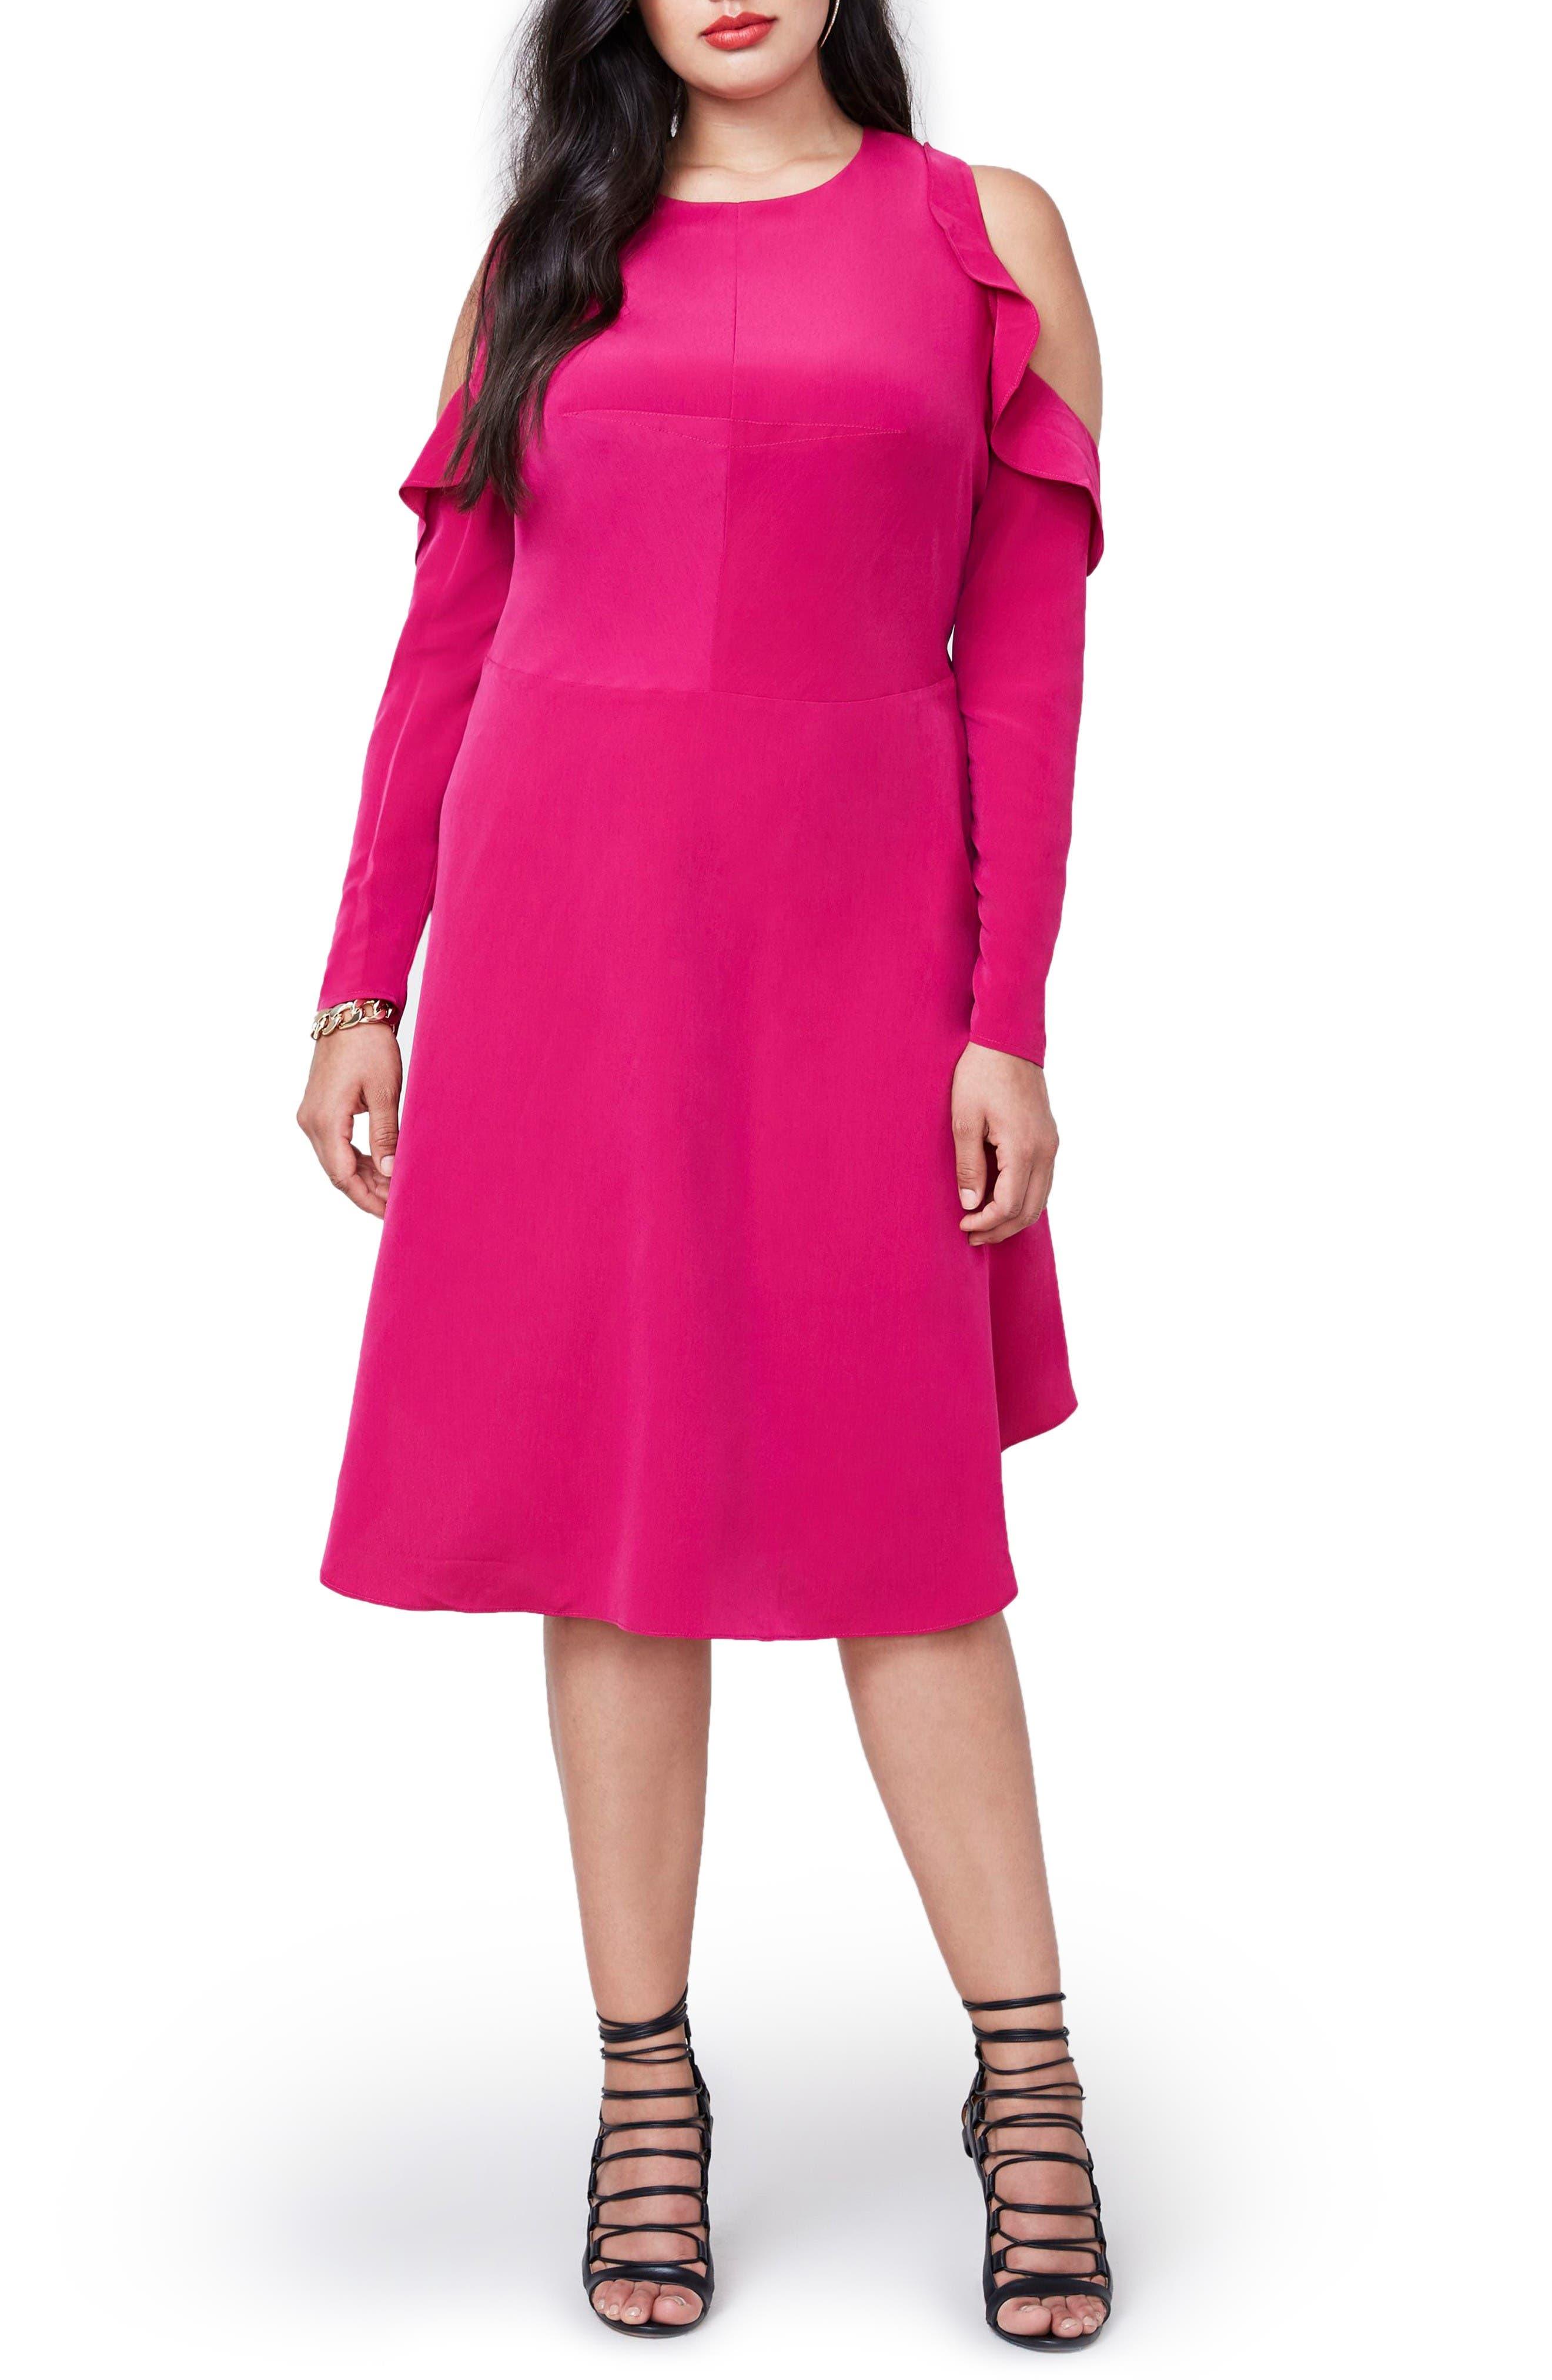 RACHEL Rachel Roy Ruffle Cold Shoulder Dress,                             Main thumbnail 1, color,                             Fuchsia